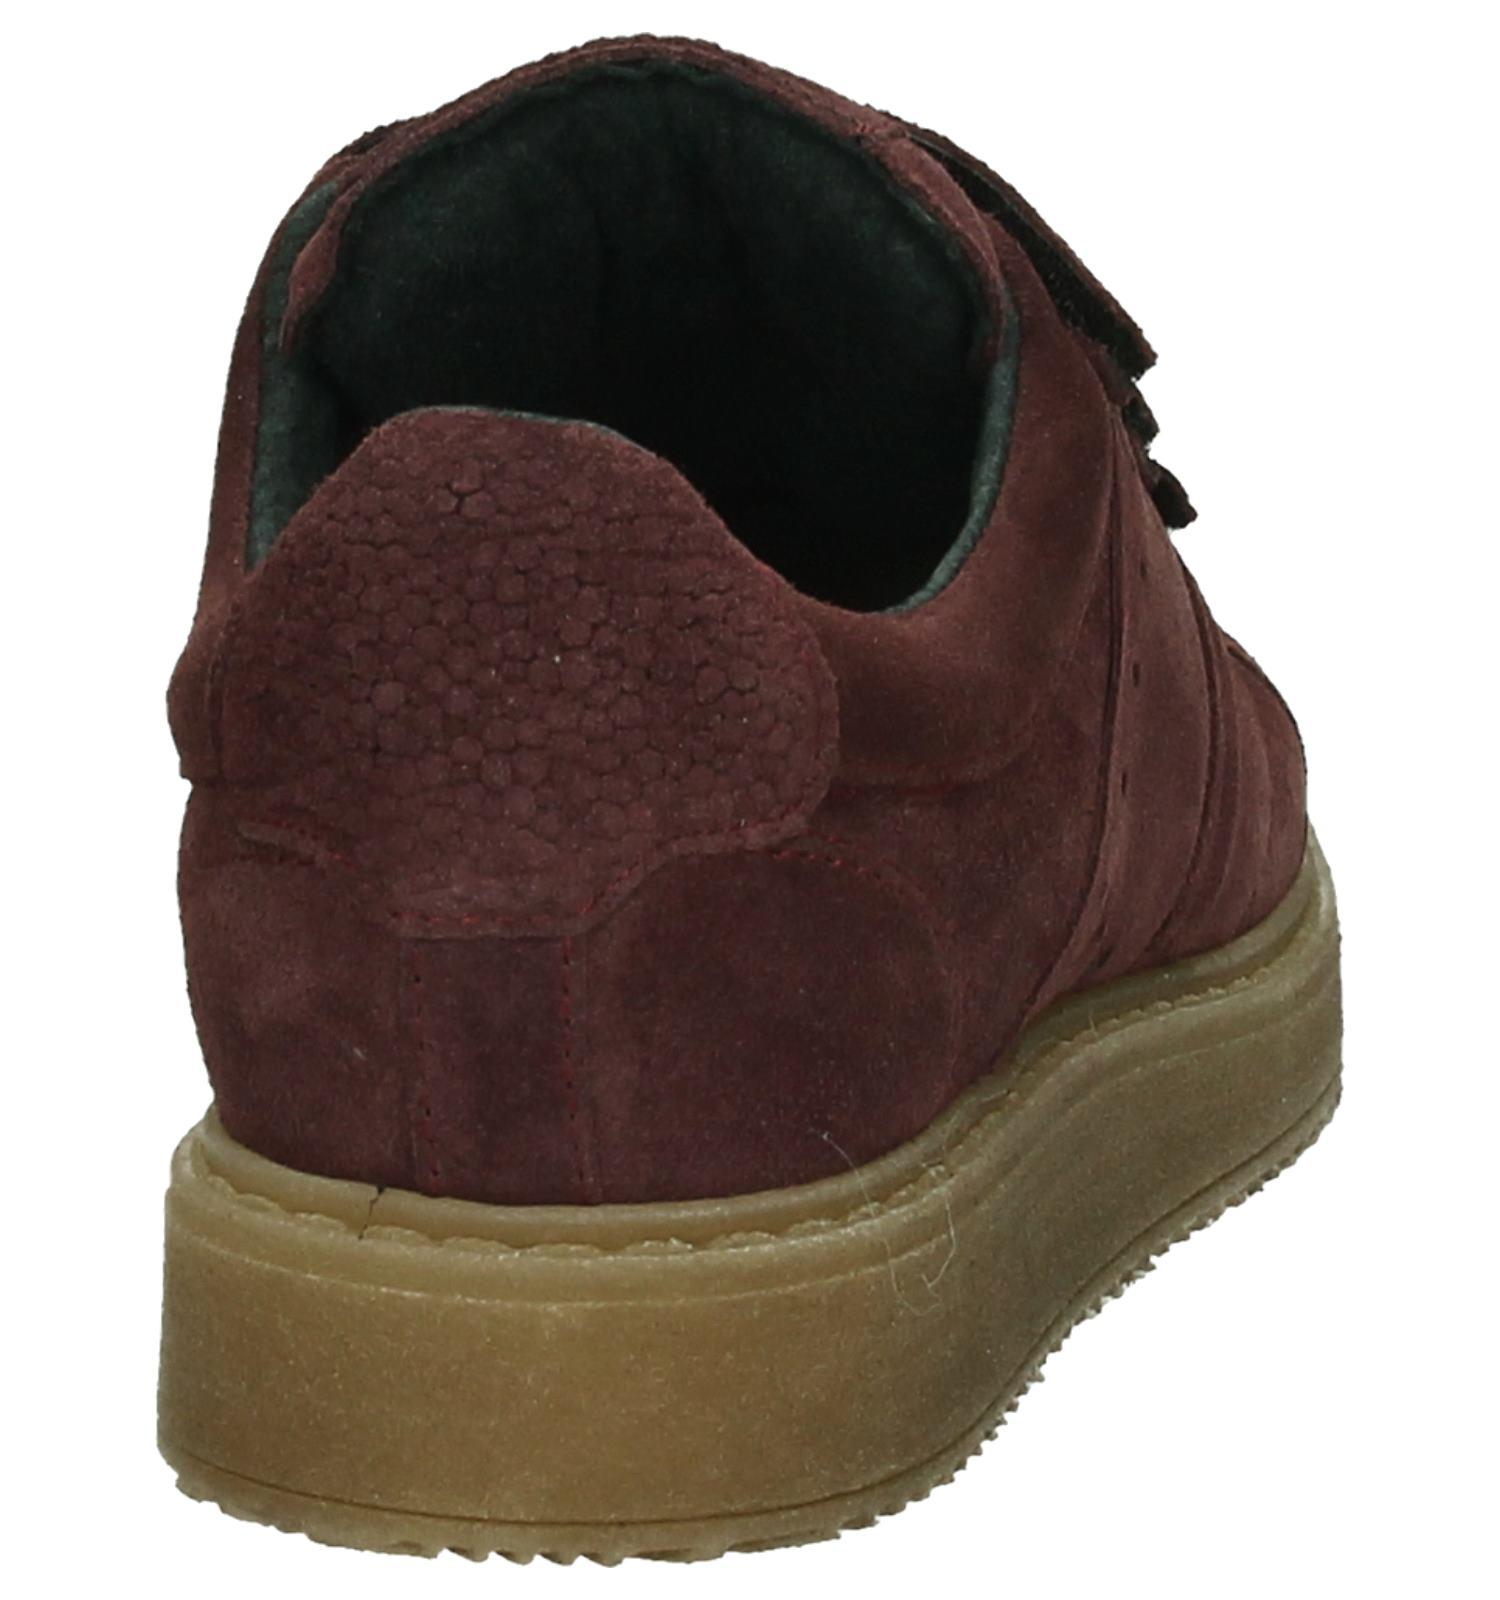 Gratis Sneakers Bordeaux be Shoecolate Velcro Torfs Verzend Met AYCYxq